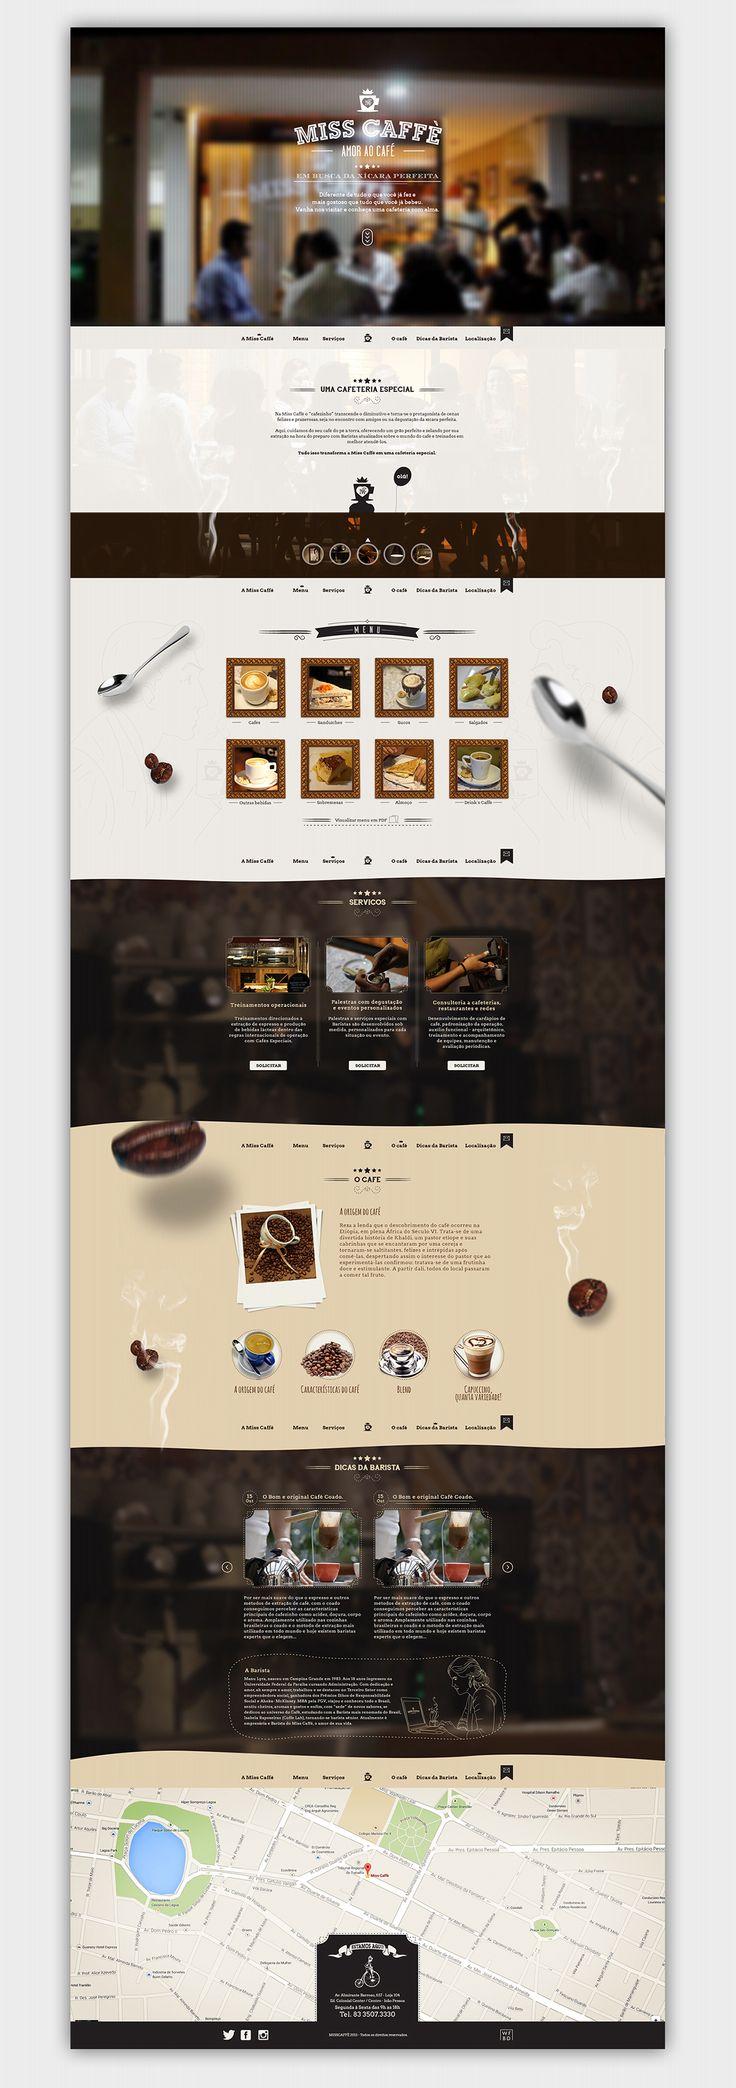 Website MissCaffè on Web Design Served